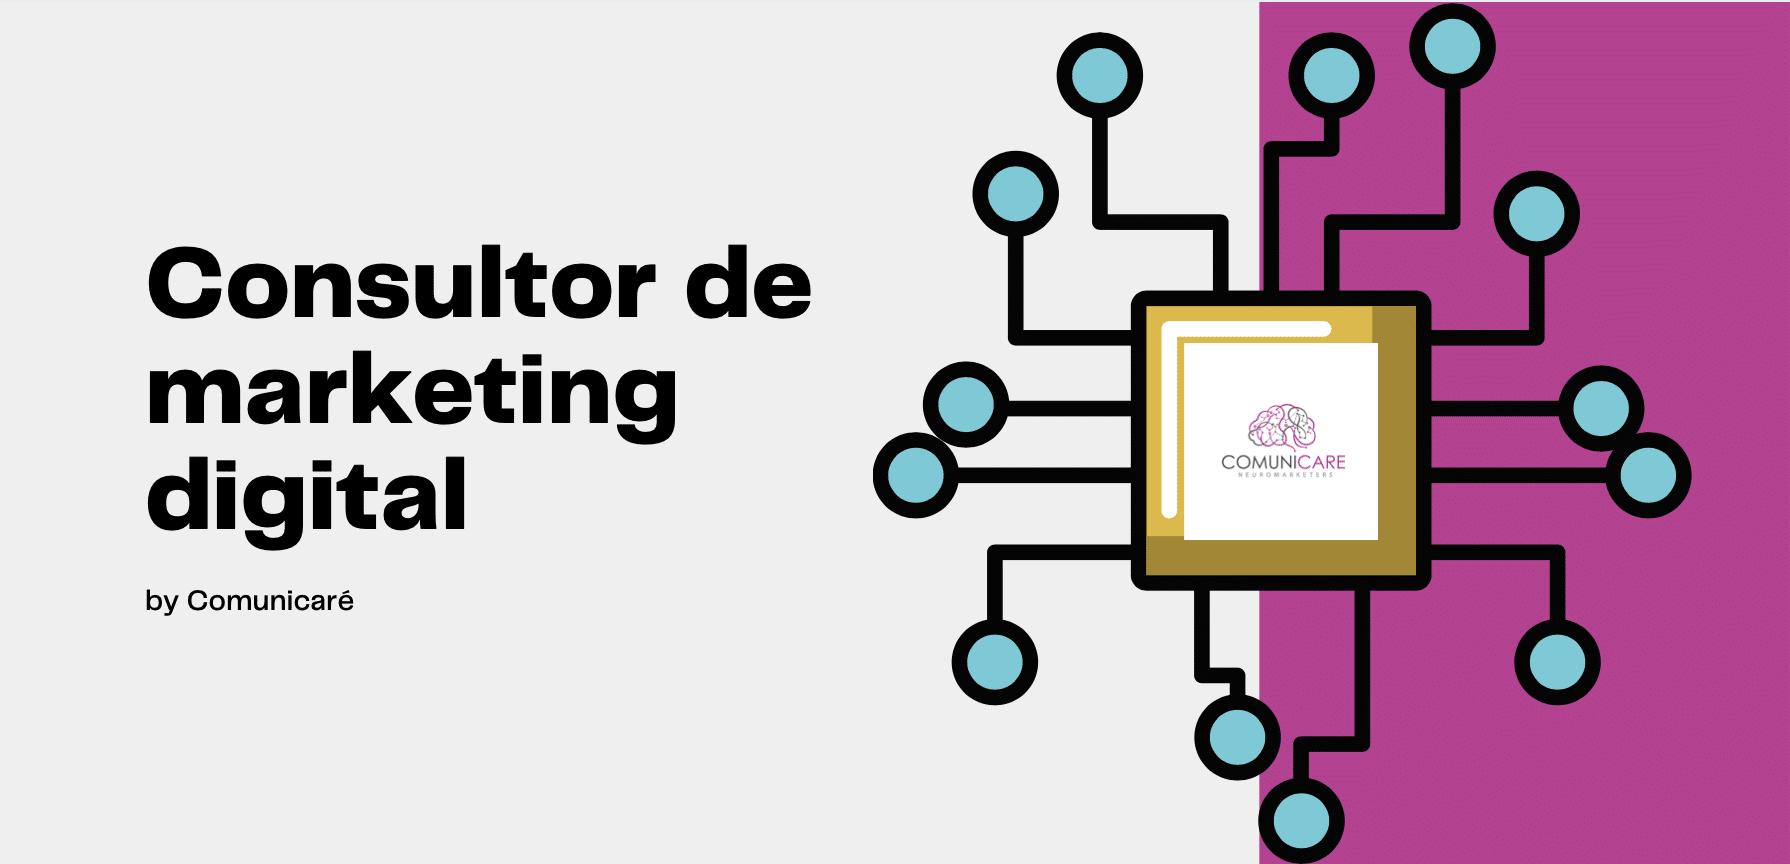 Consultor marketing digital España: mejores agencias - Comunicare